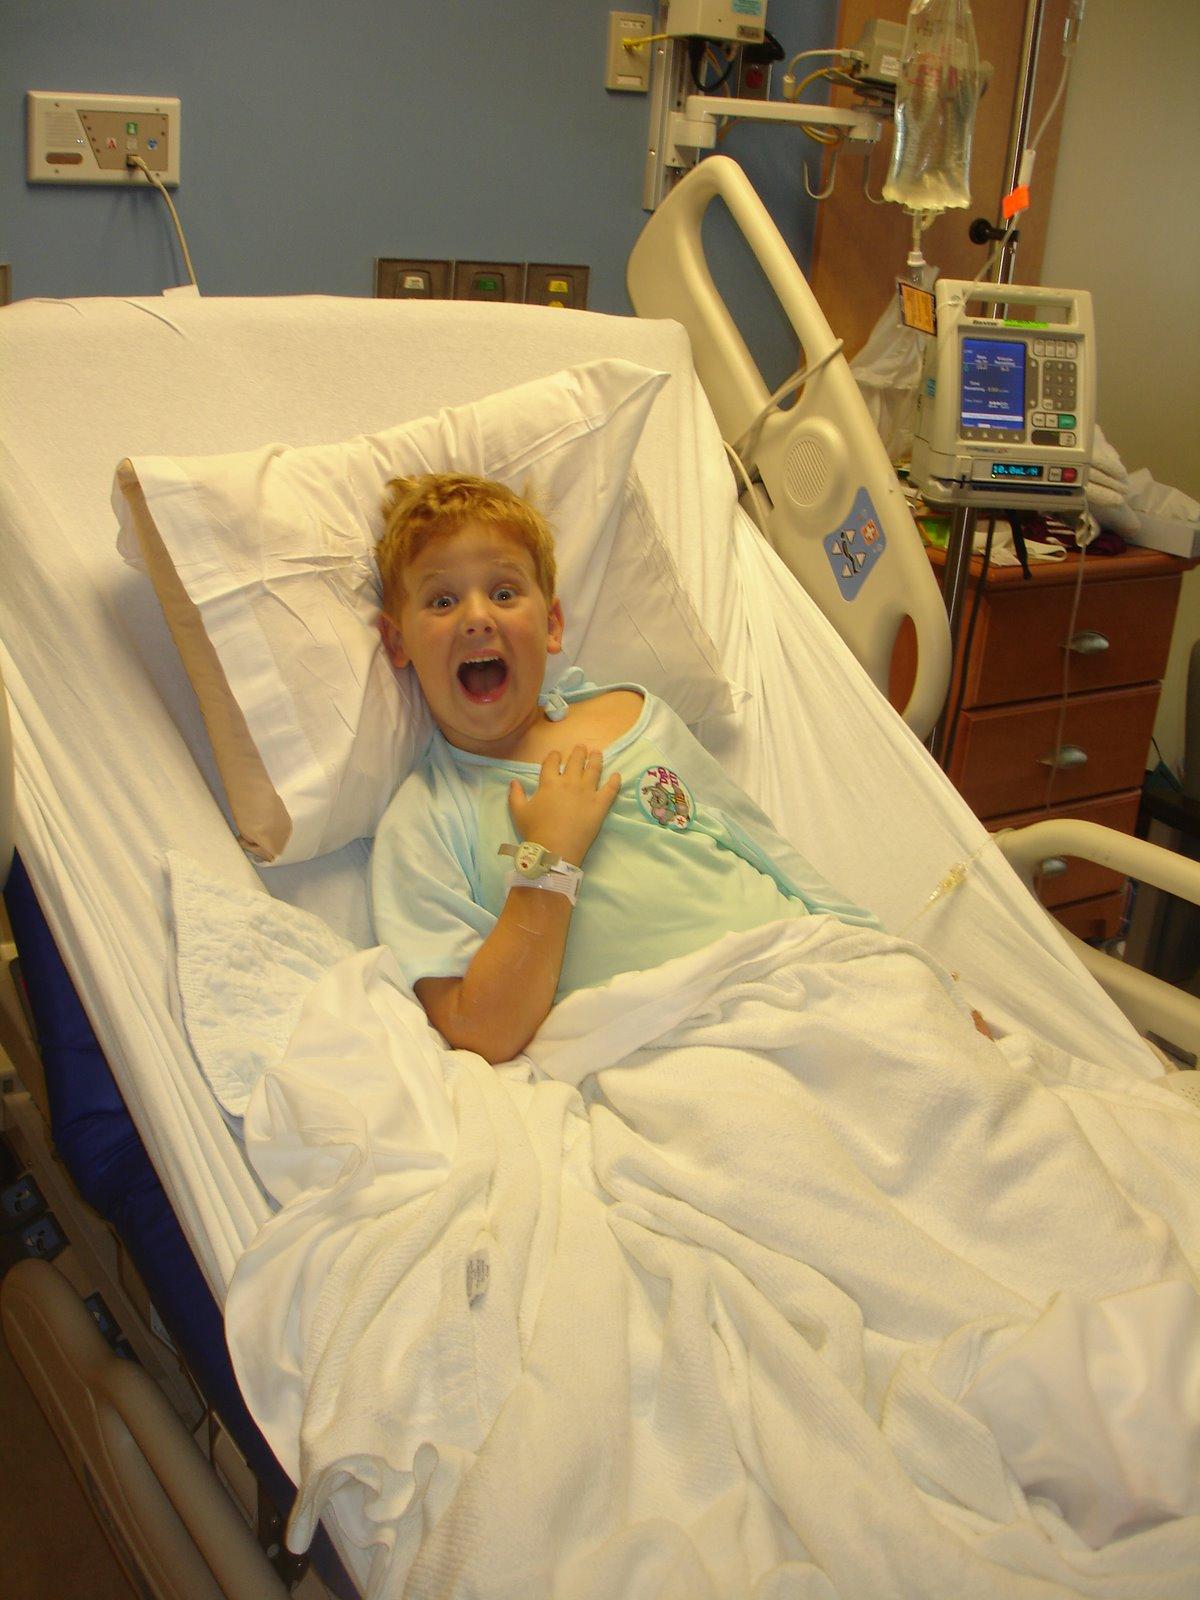 [Parker+in+hospital+8.09+002.jpg]